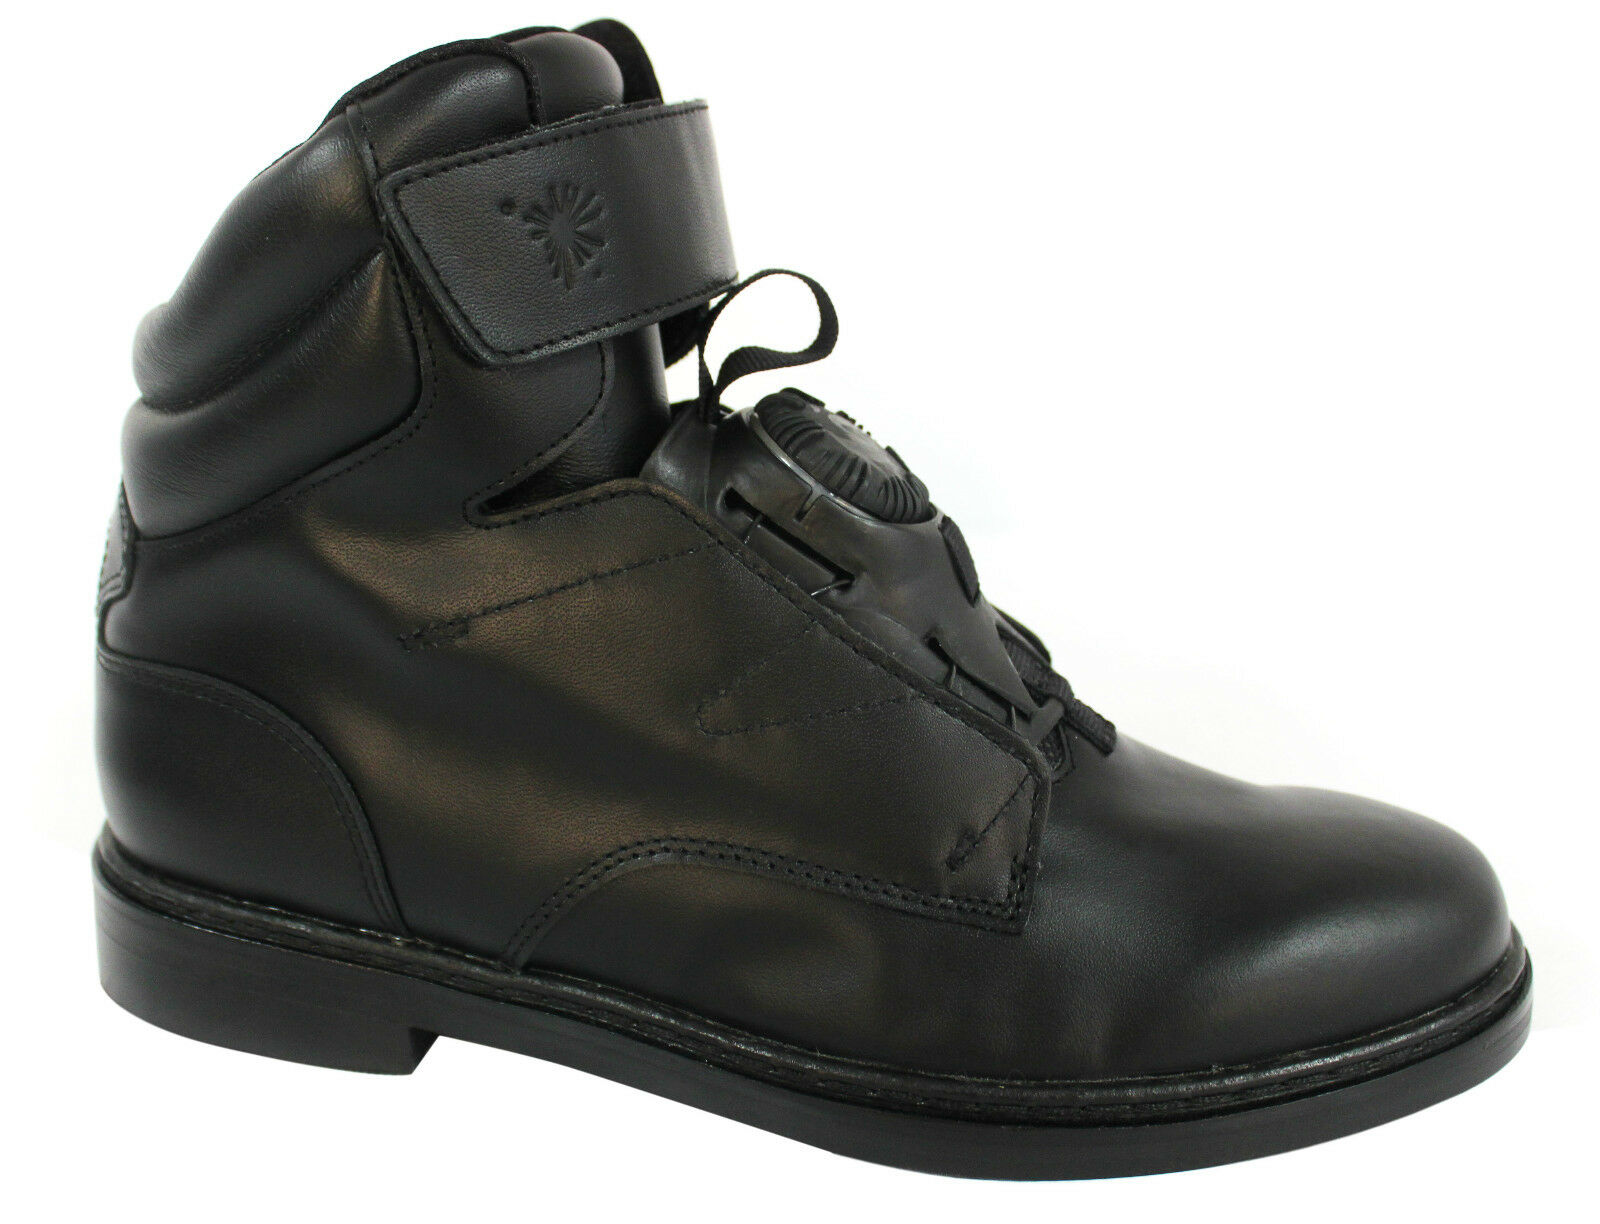 Puma Mihara Yasuhiro My-78 Hombre Disc Brogue botas botas botas 357081 01 D49 f98b86